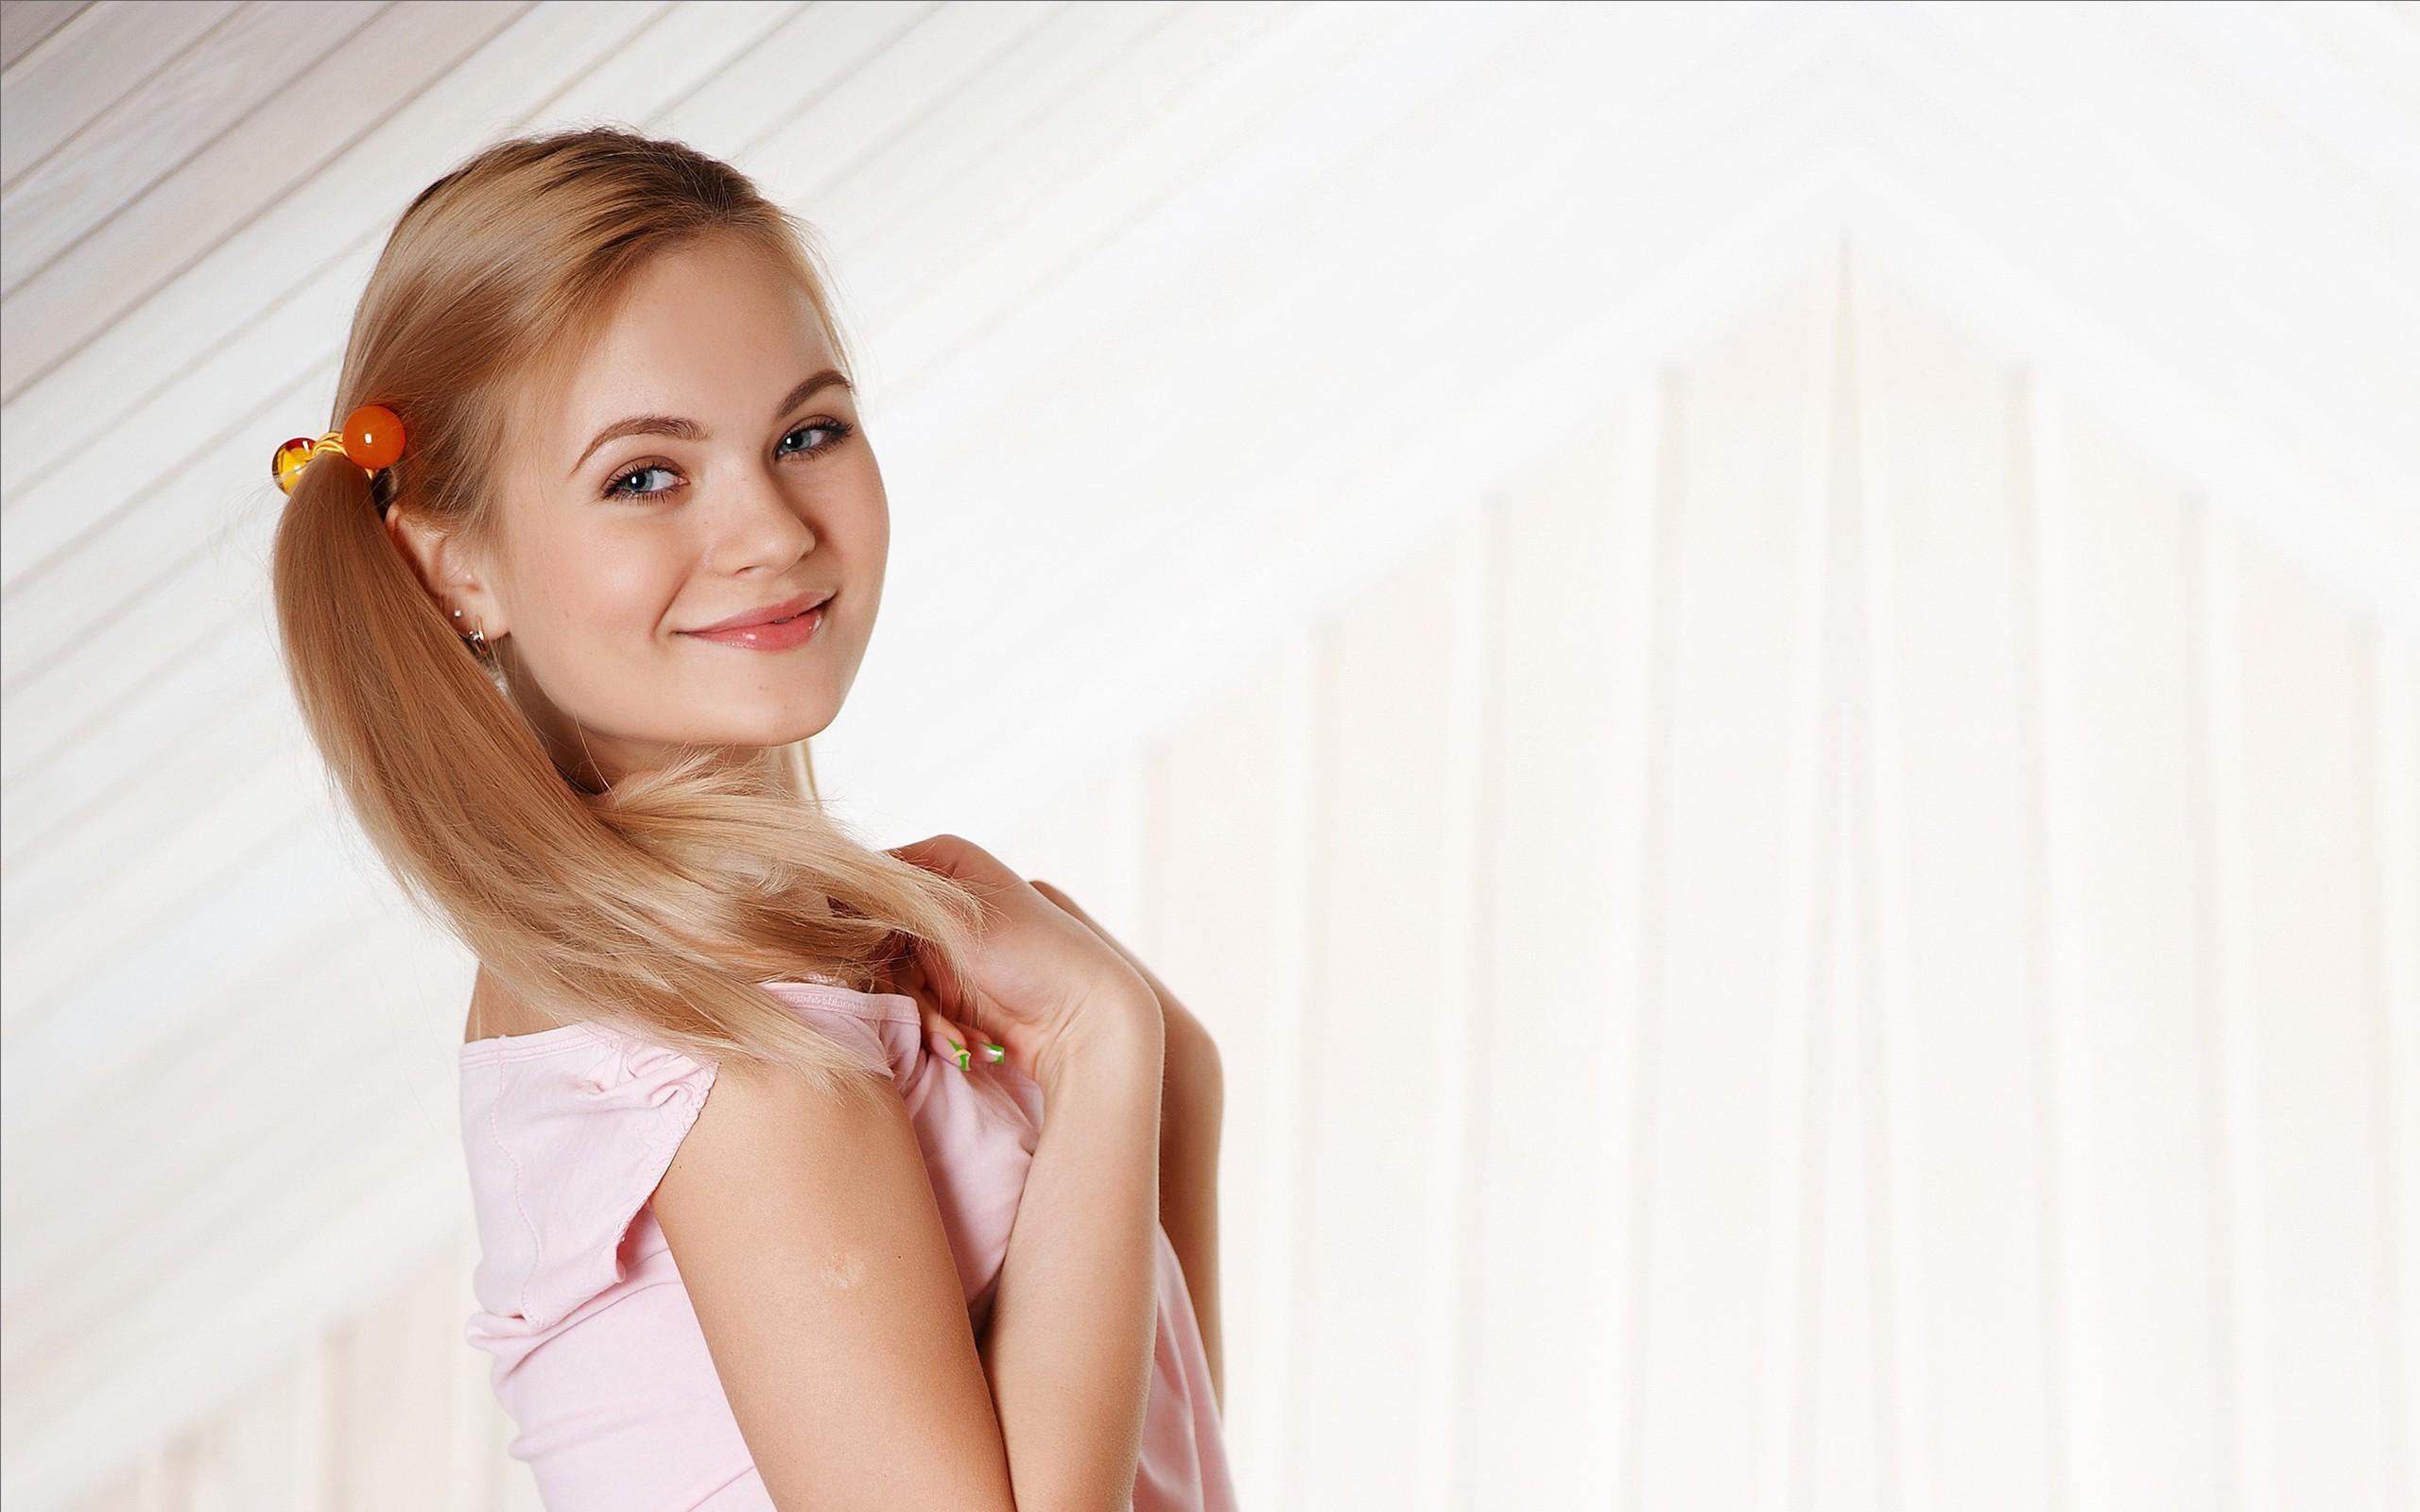 Wallpaper : women, model, blonde, simple background, long hair ...